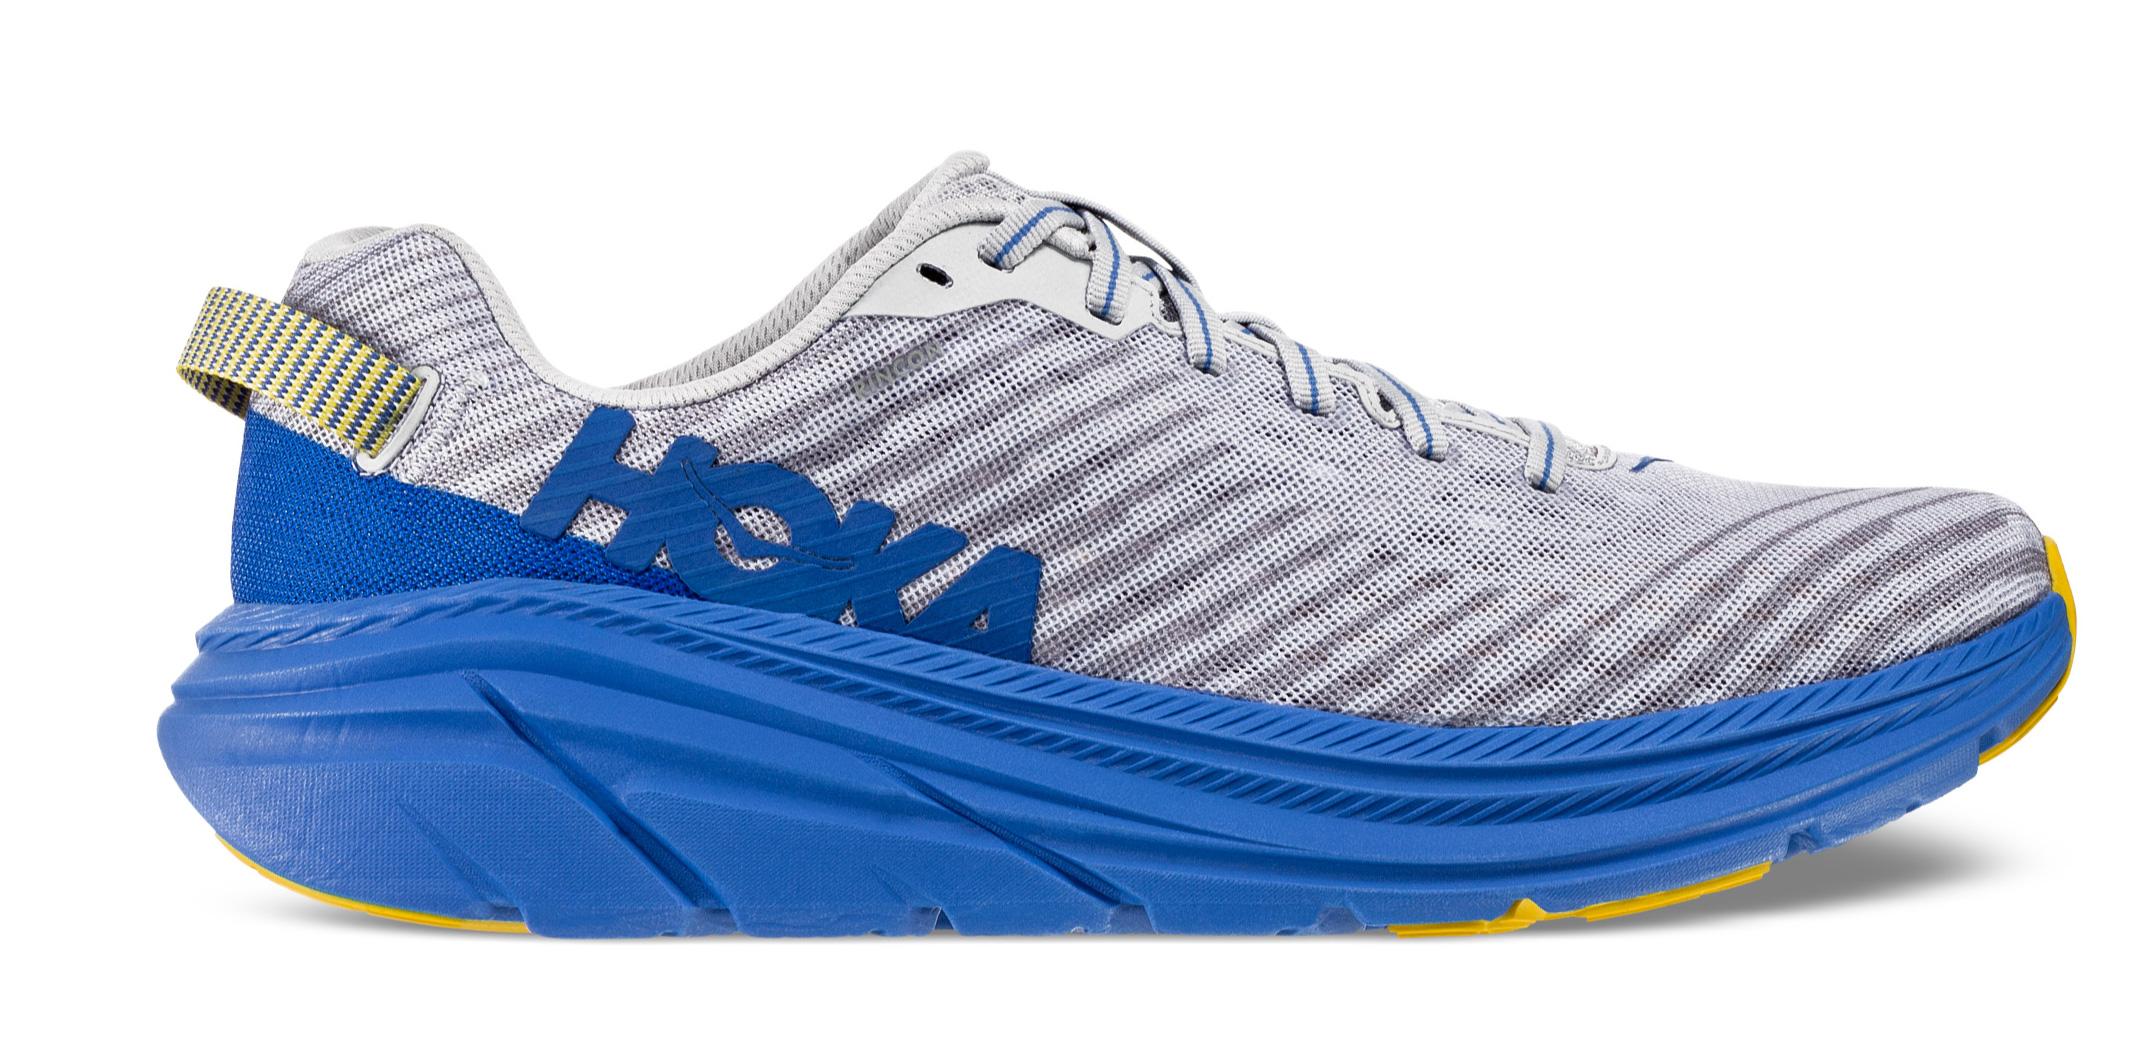 Hoka Rincon - Running shoes - Men's